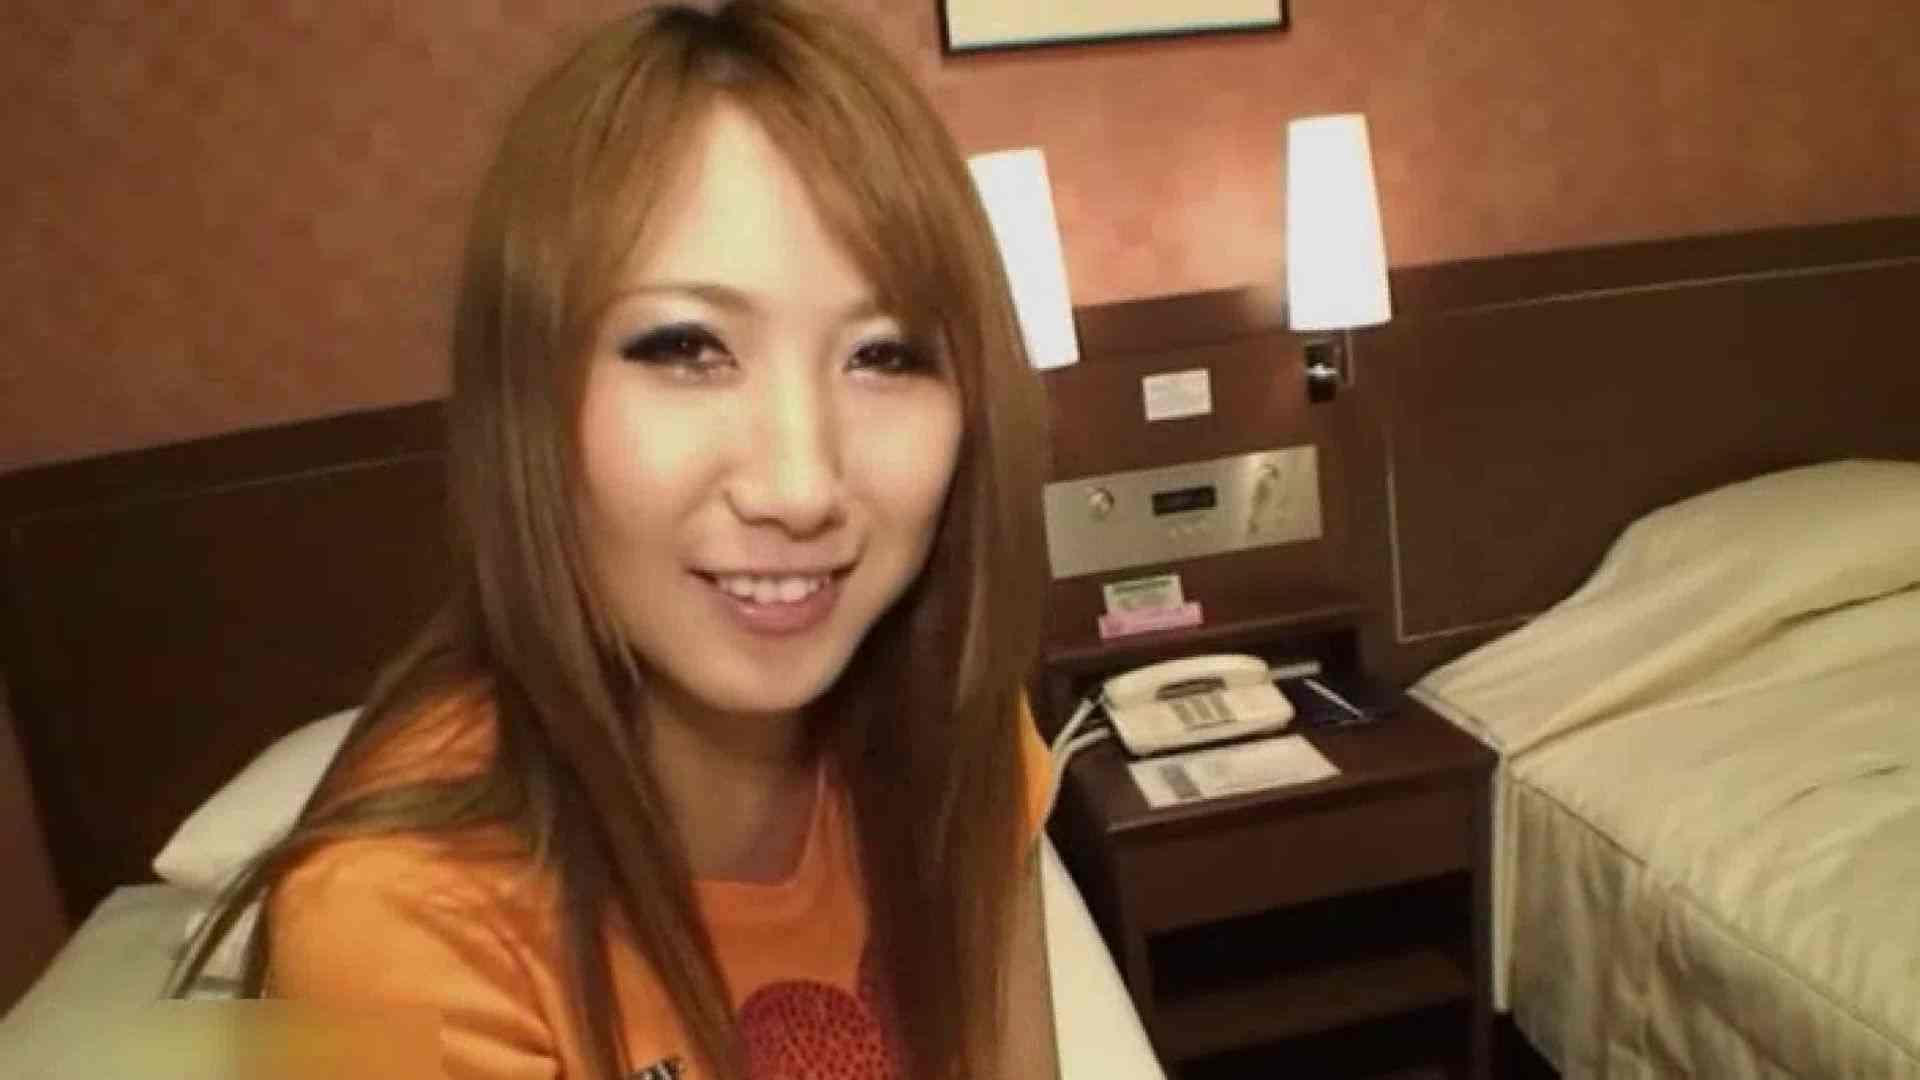 S級厳選美女ビッチガールVol.02 OLエロ画像 盗撮われめAV動画紹介 67PICs 2